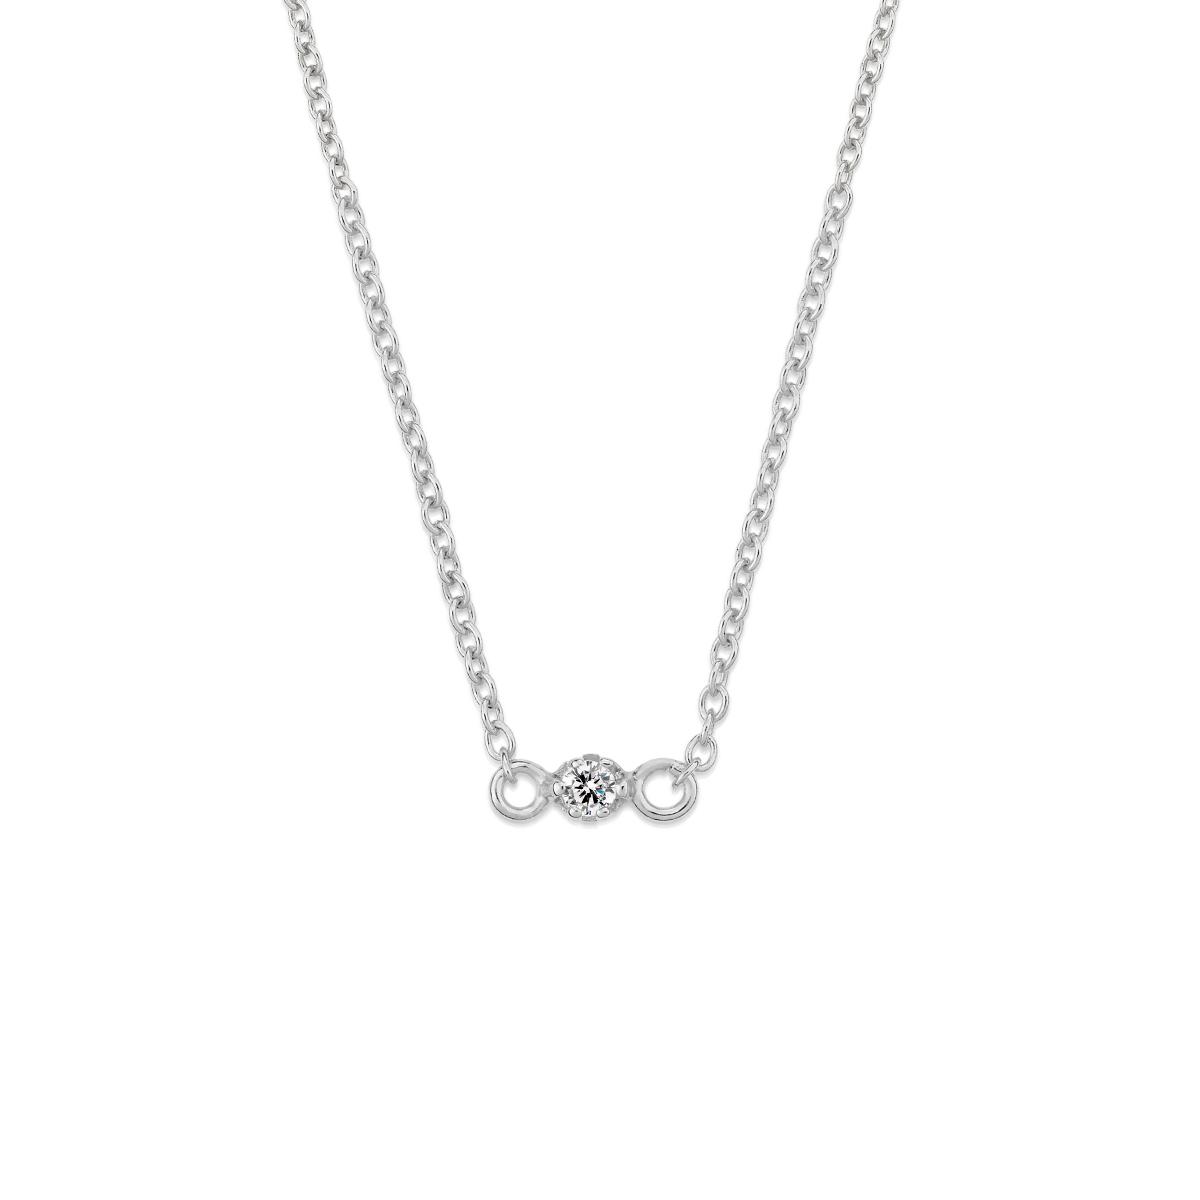 AS50 星情寄語-單鑽細緻項鍊/頸鍊/腳鍊